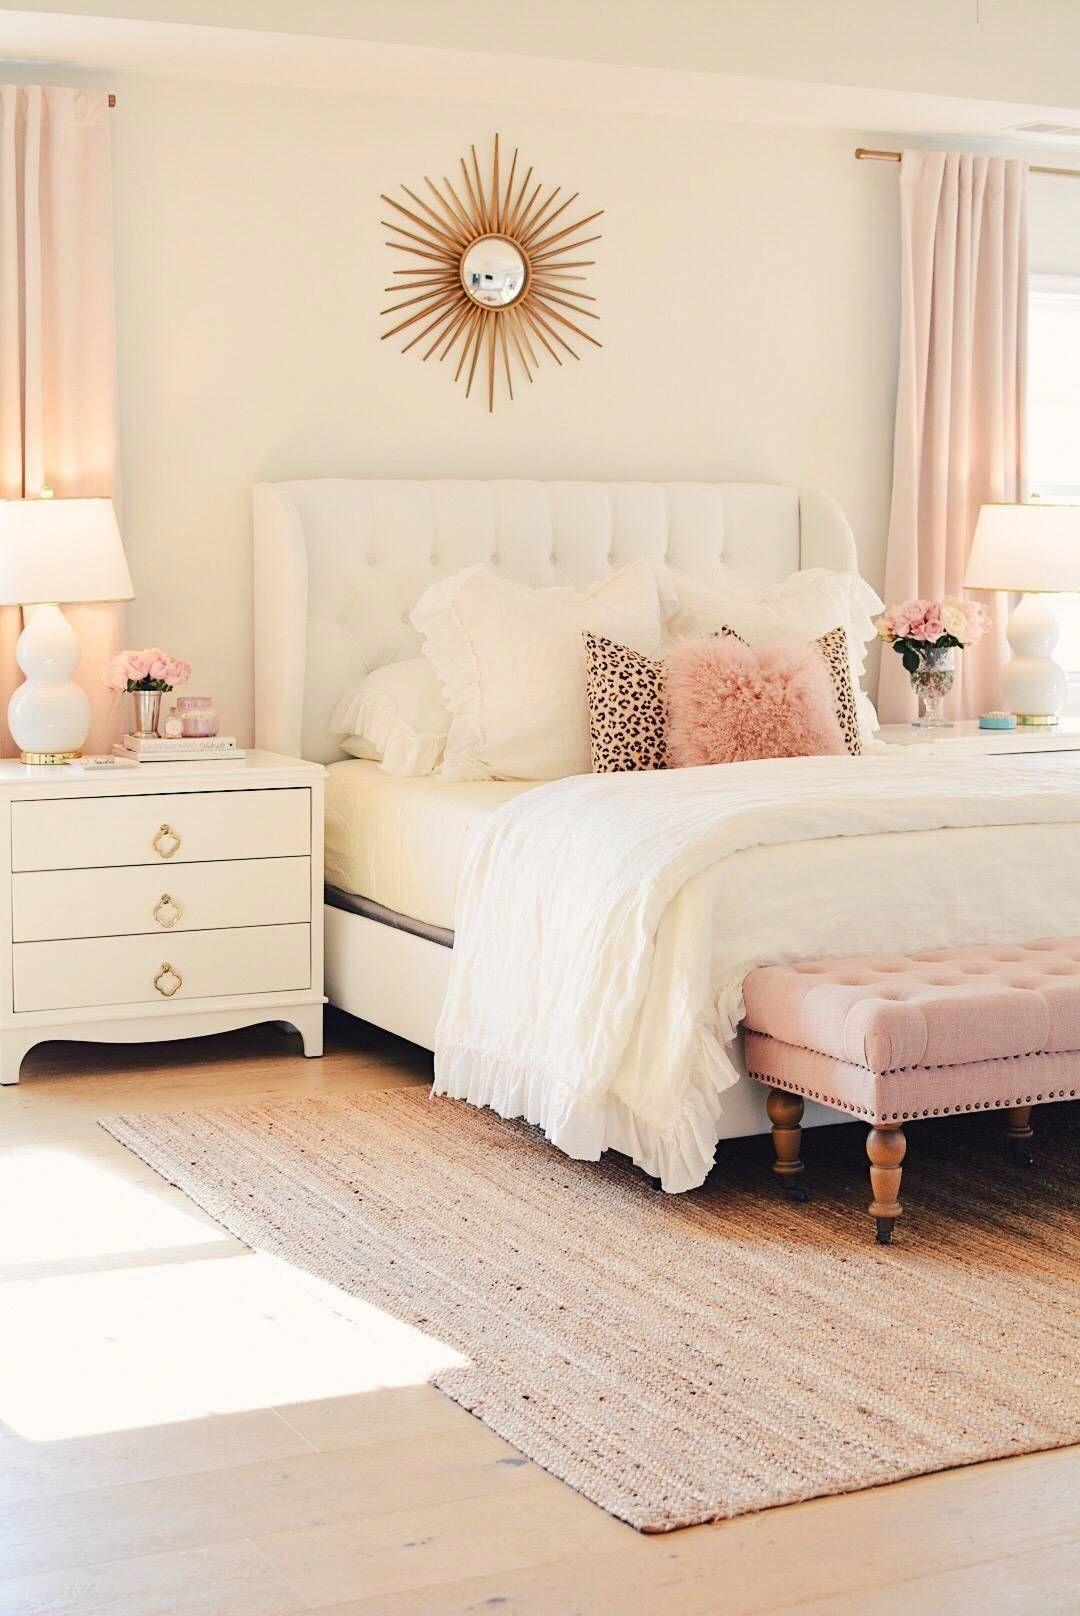 Romantic White Bedroom: Master Bedroom Makeover, White Tufted Bed, White And Gold